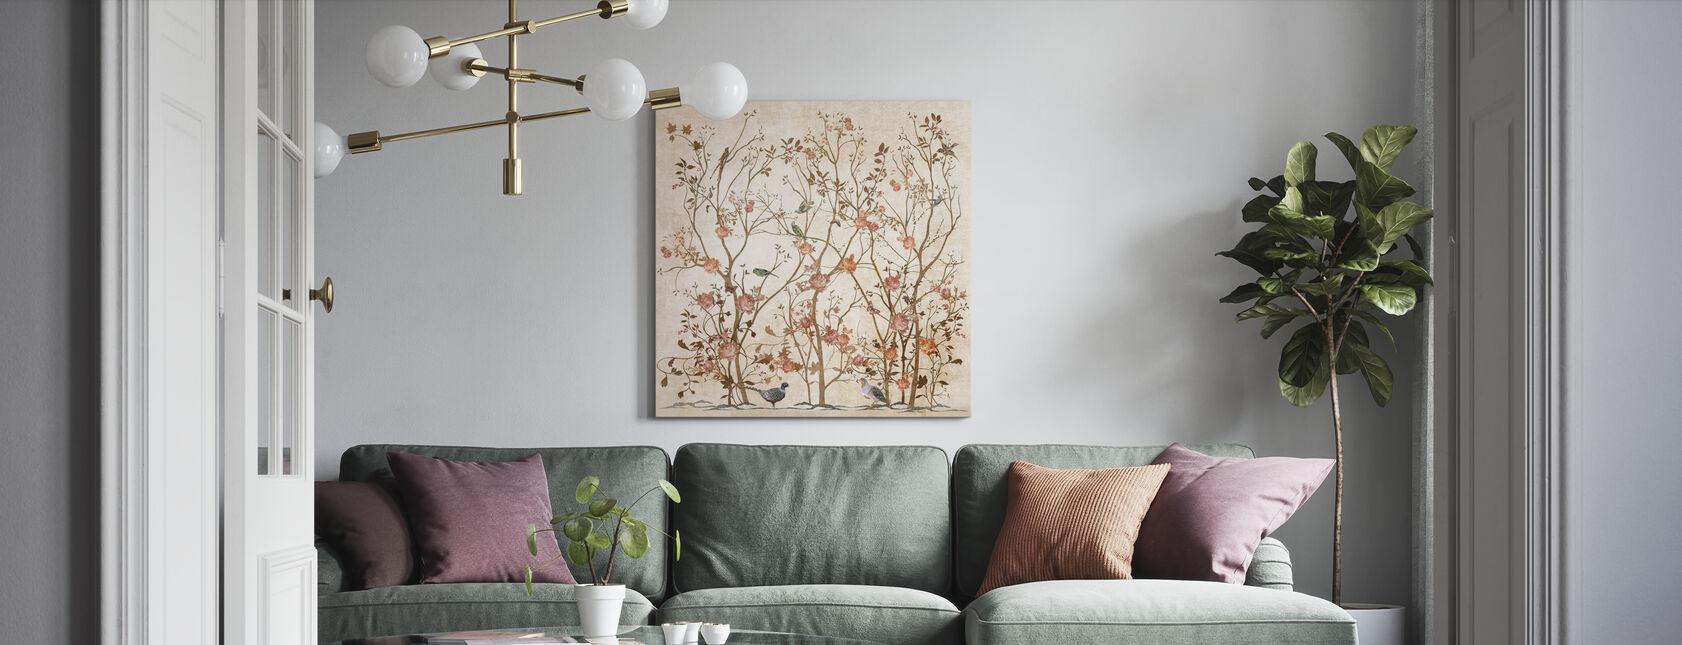 Roze Roos Bush - Canvas print - Woonkamer